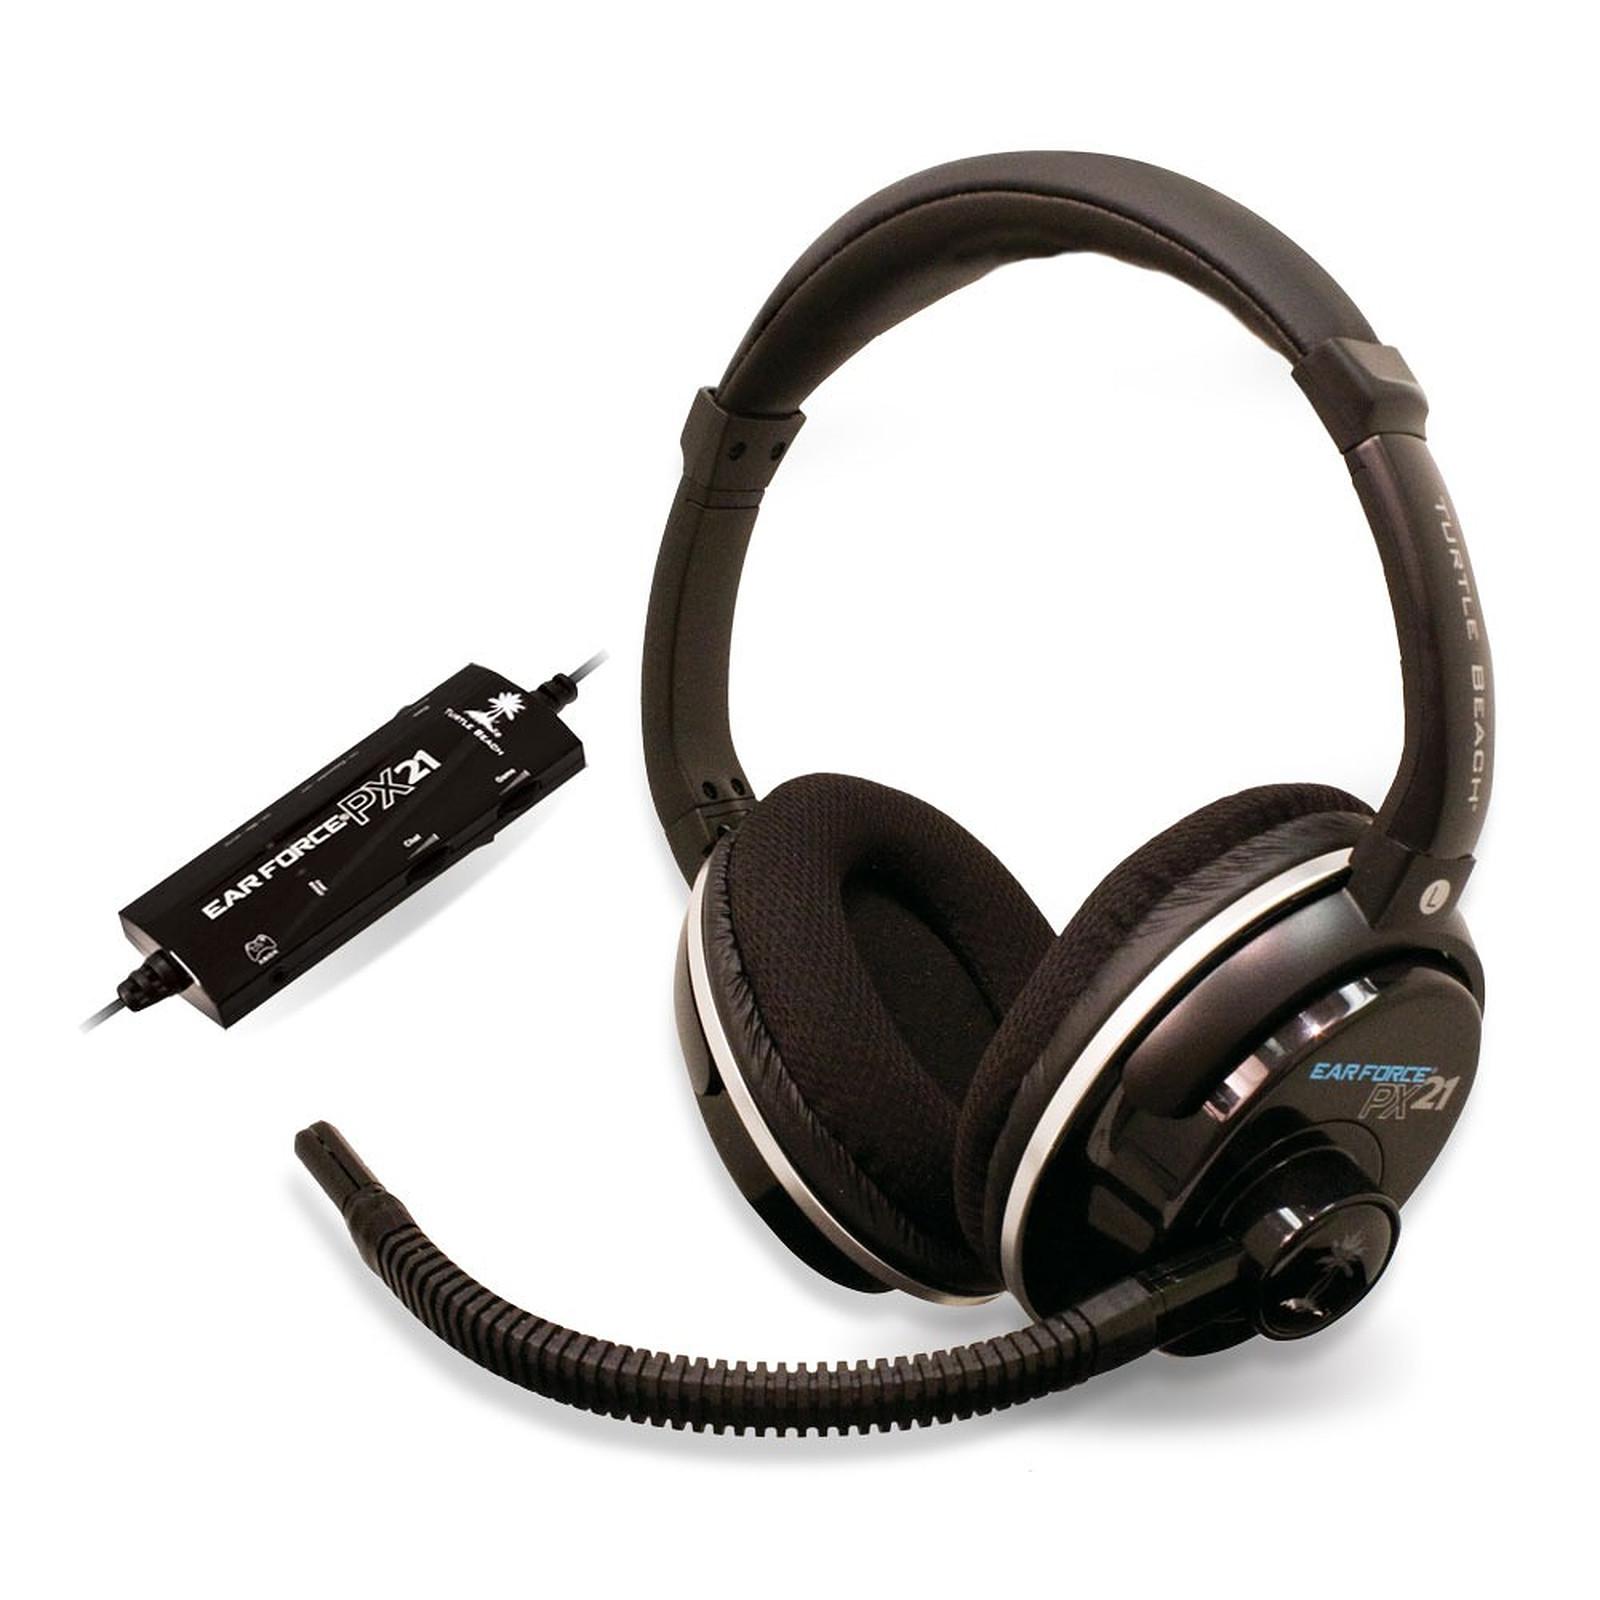 Turtle Beach Ear Force PX21